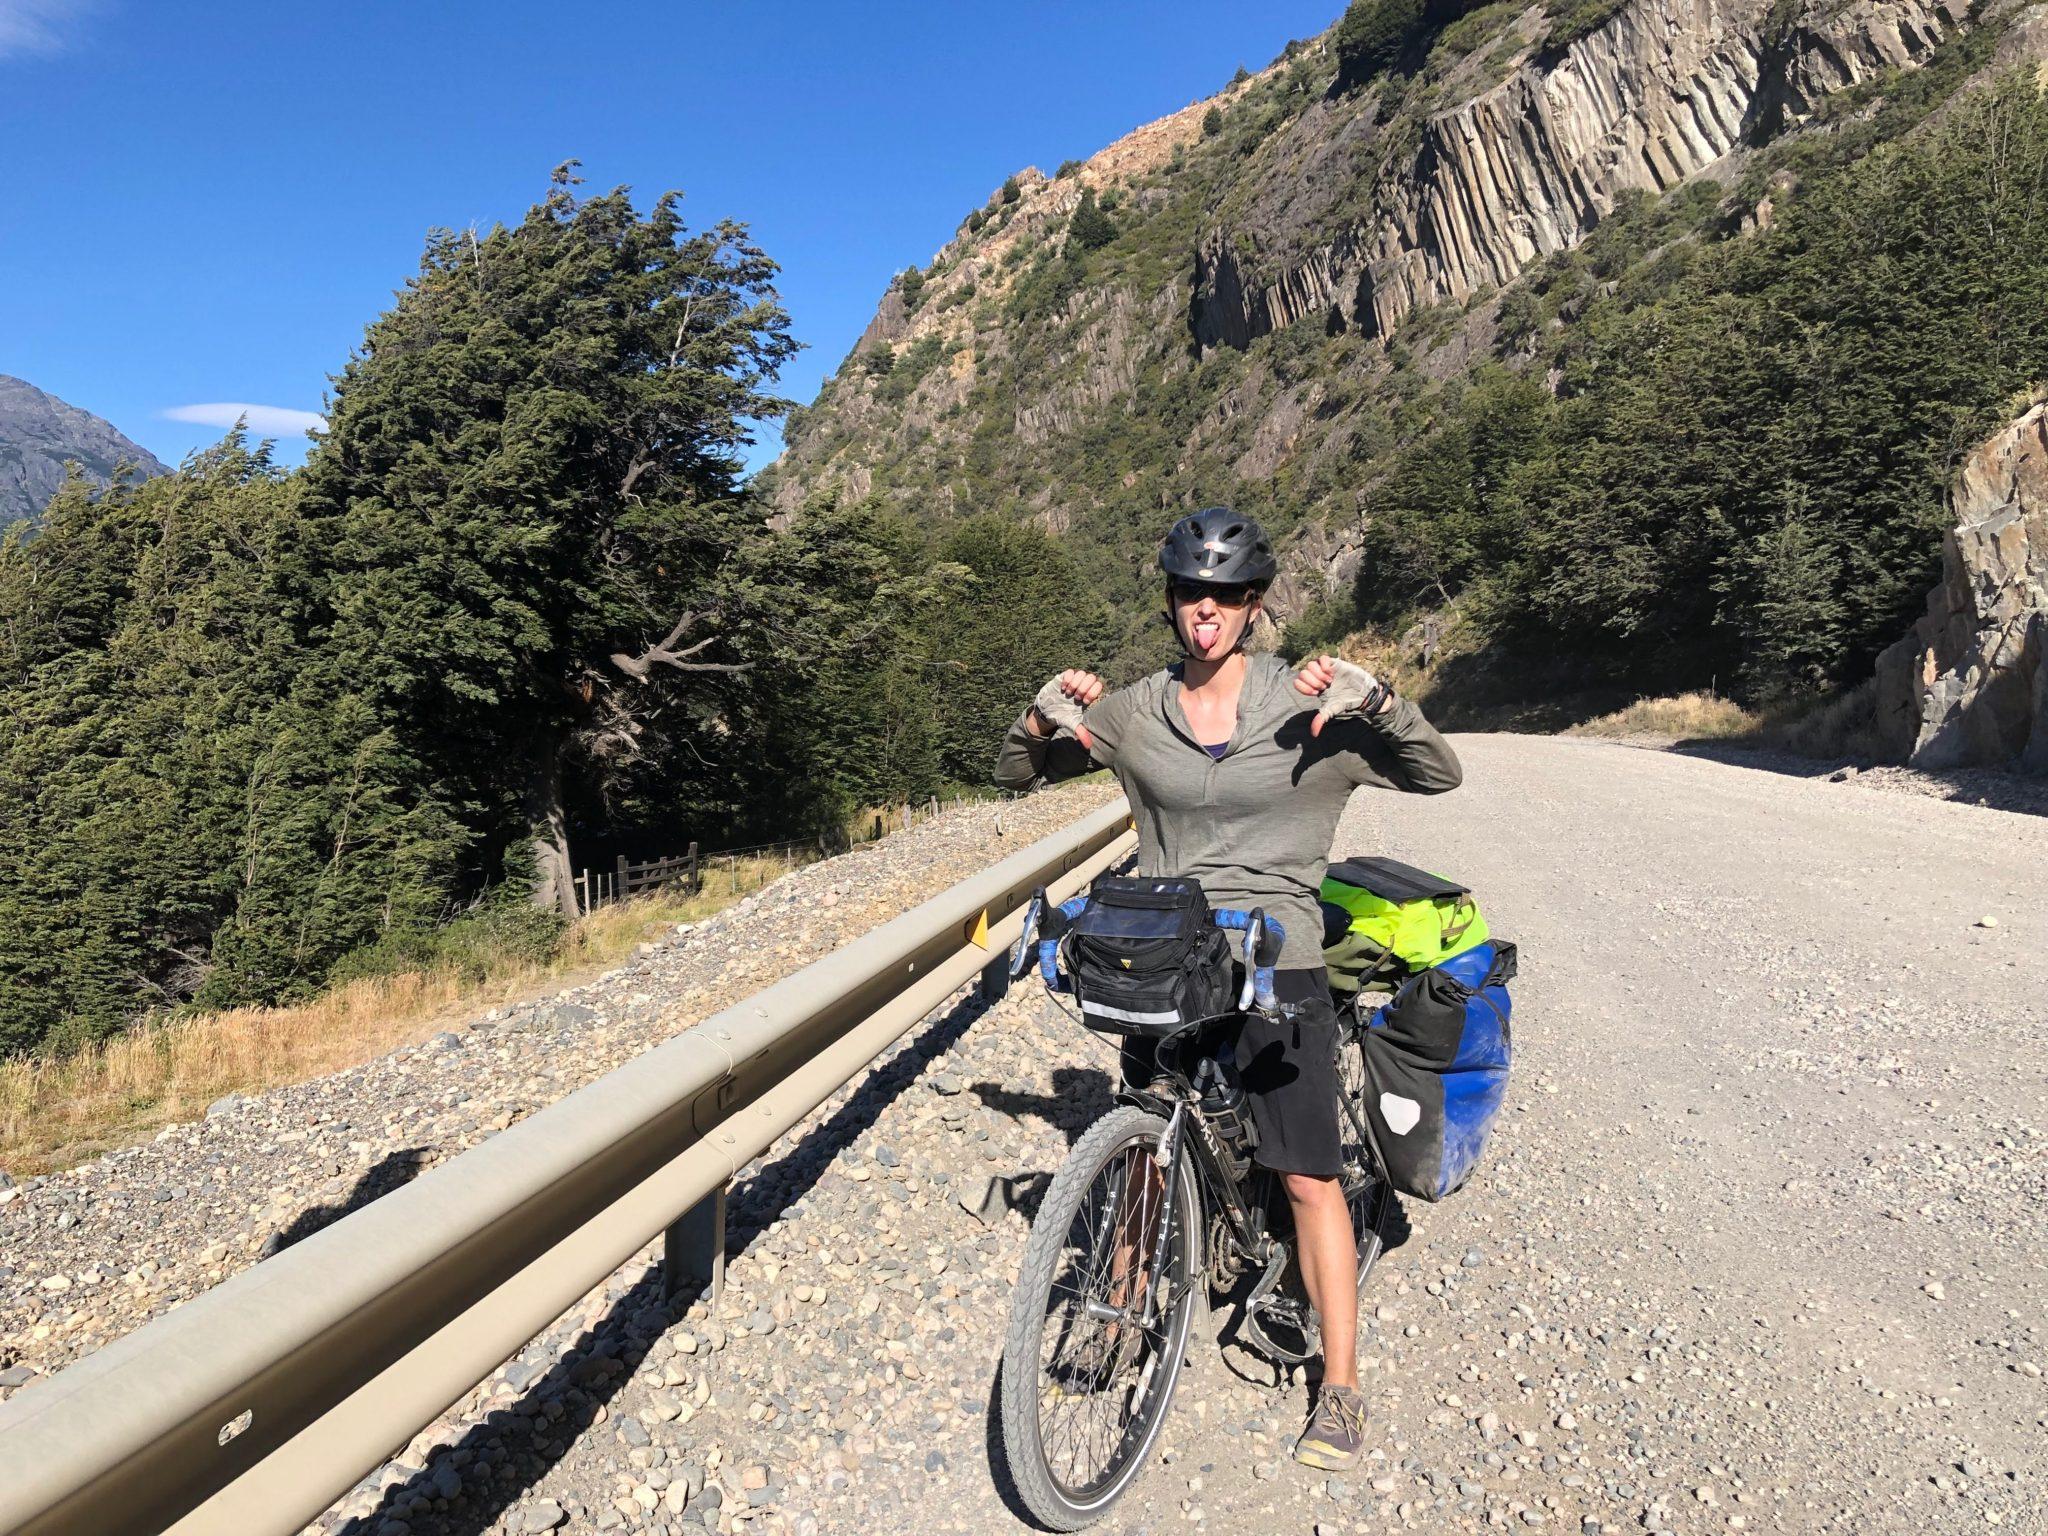 Sad cyclist touring Carretera Austral